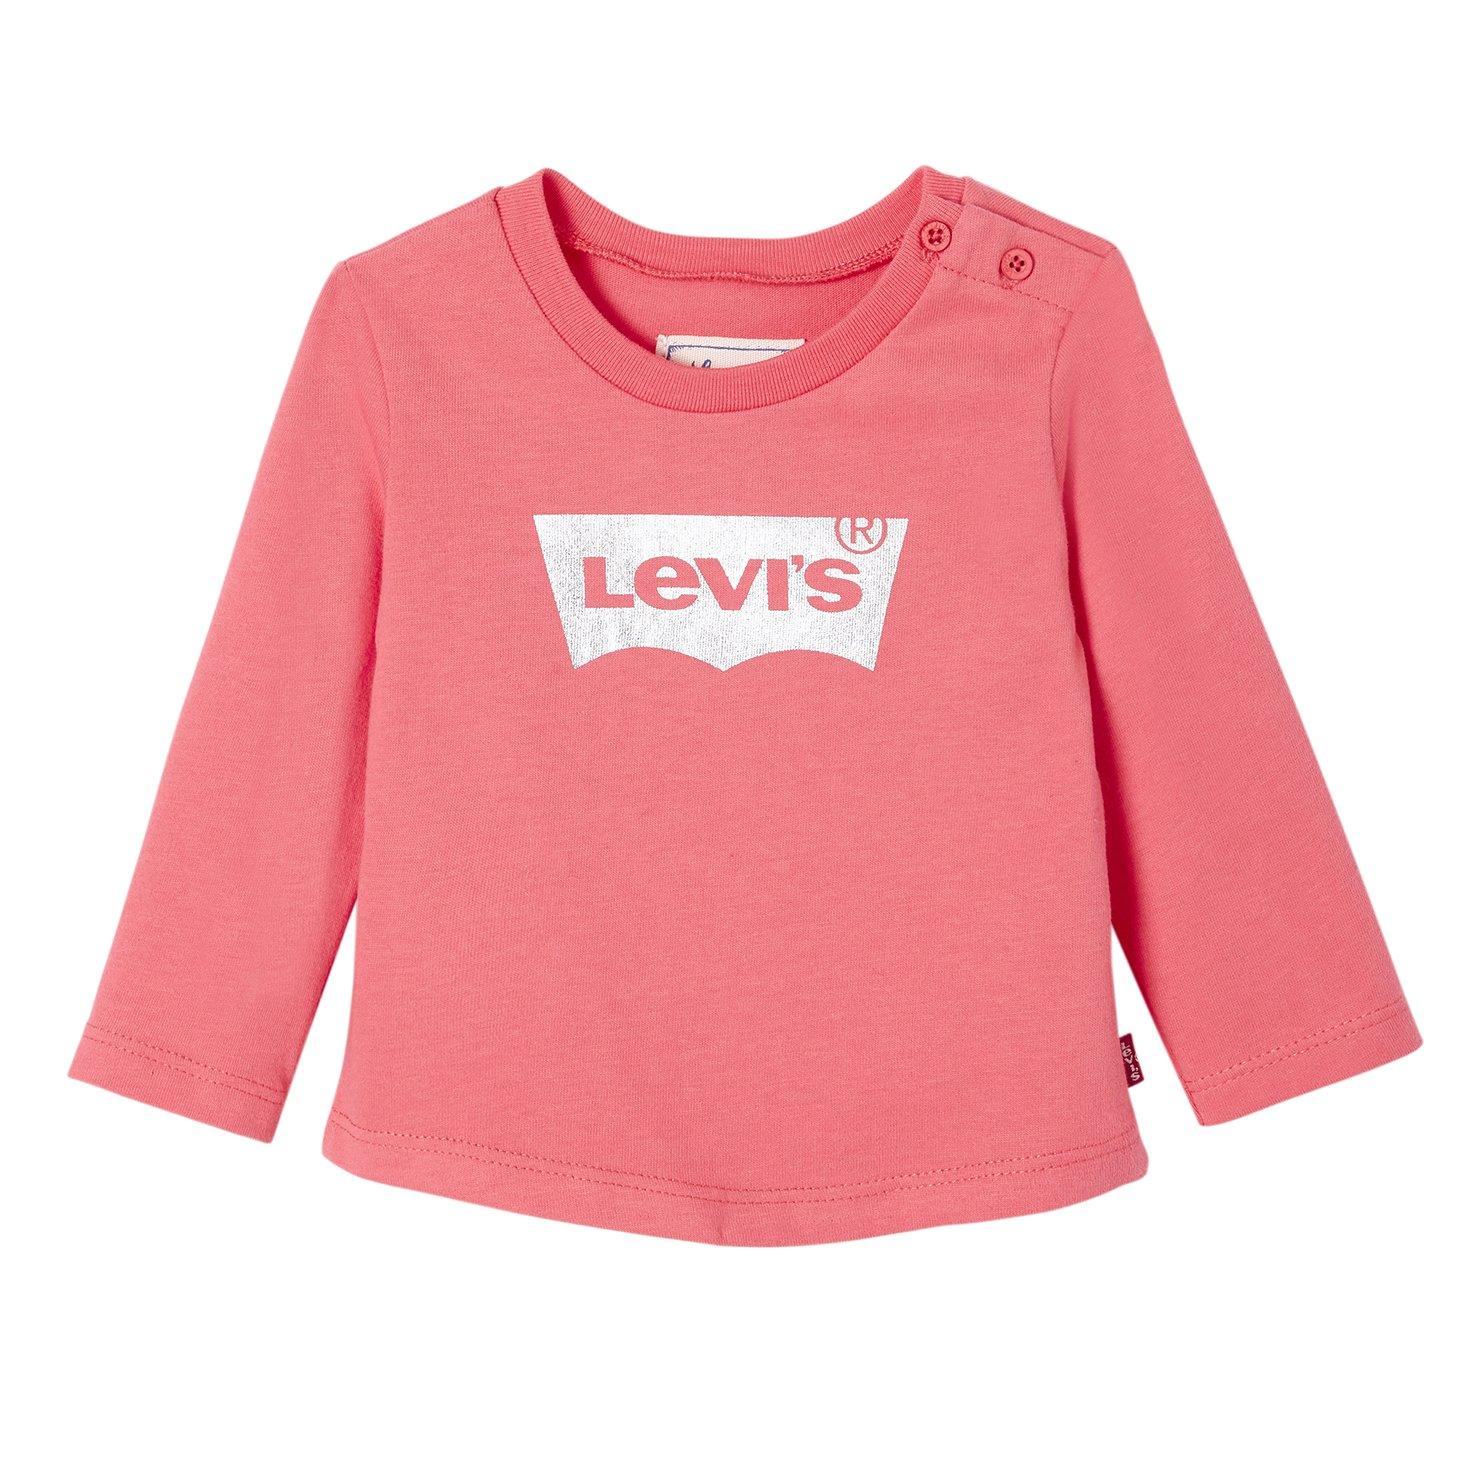 Levi's Kids T-Shirt Bimba Levi' s Kids T-Shirt Bimba TEE-SHIRT